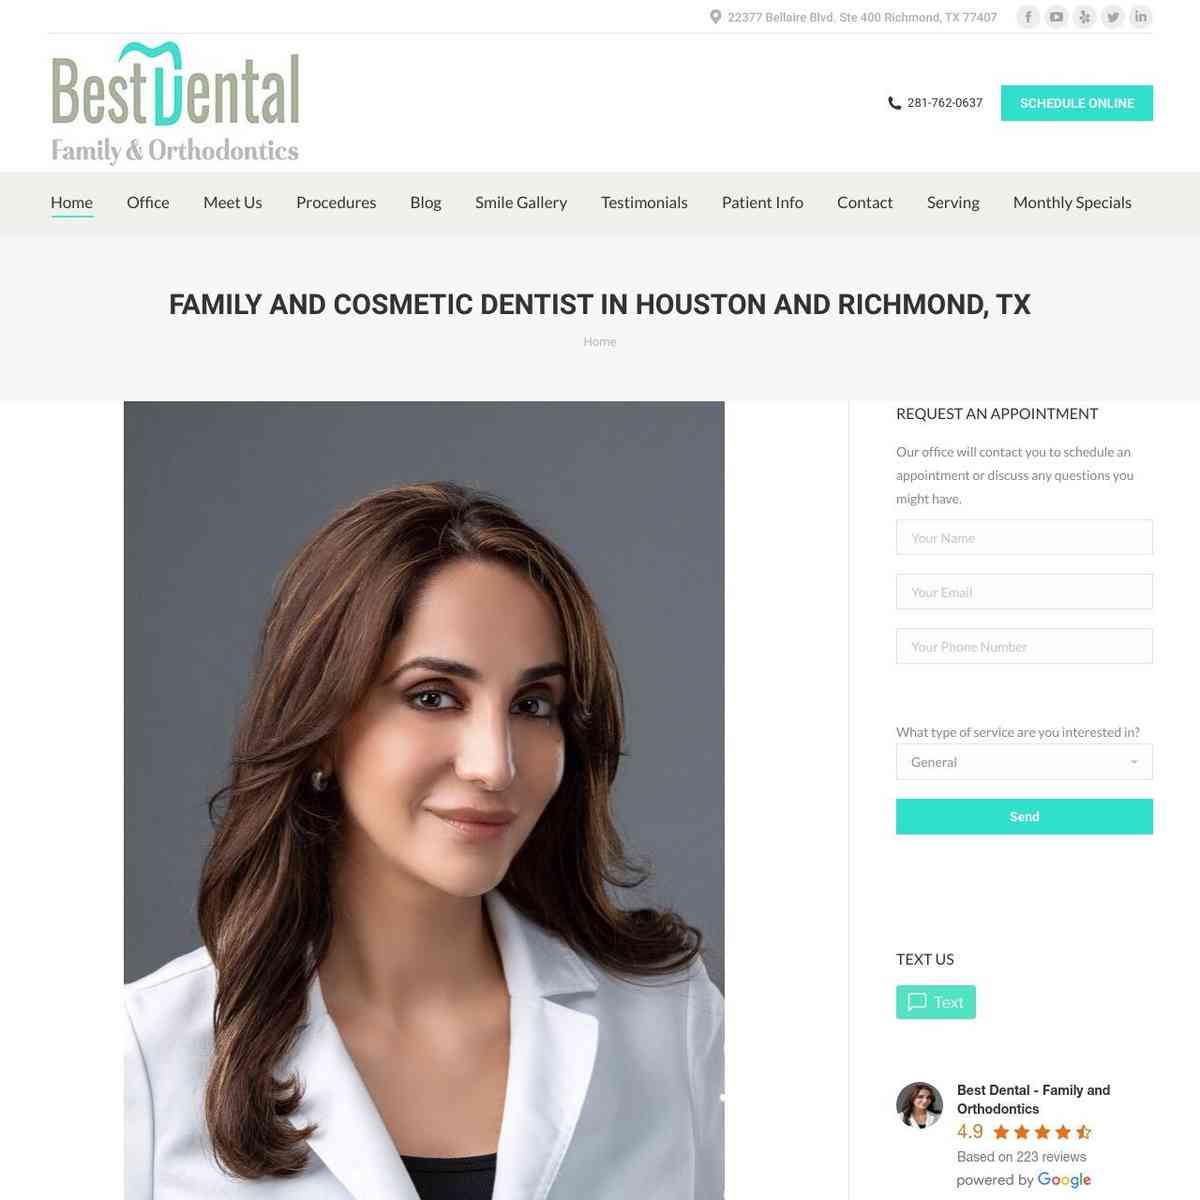 Best Dental